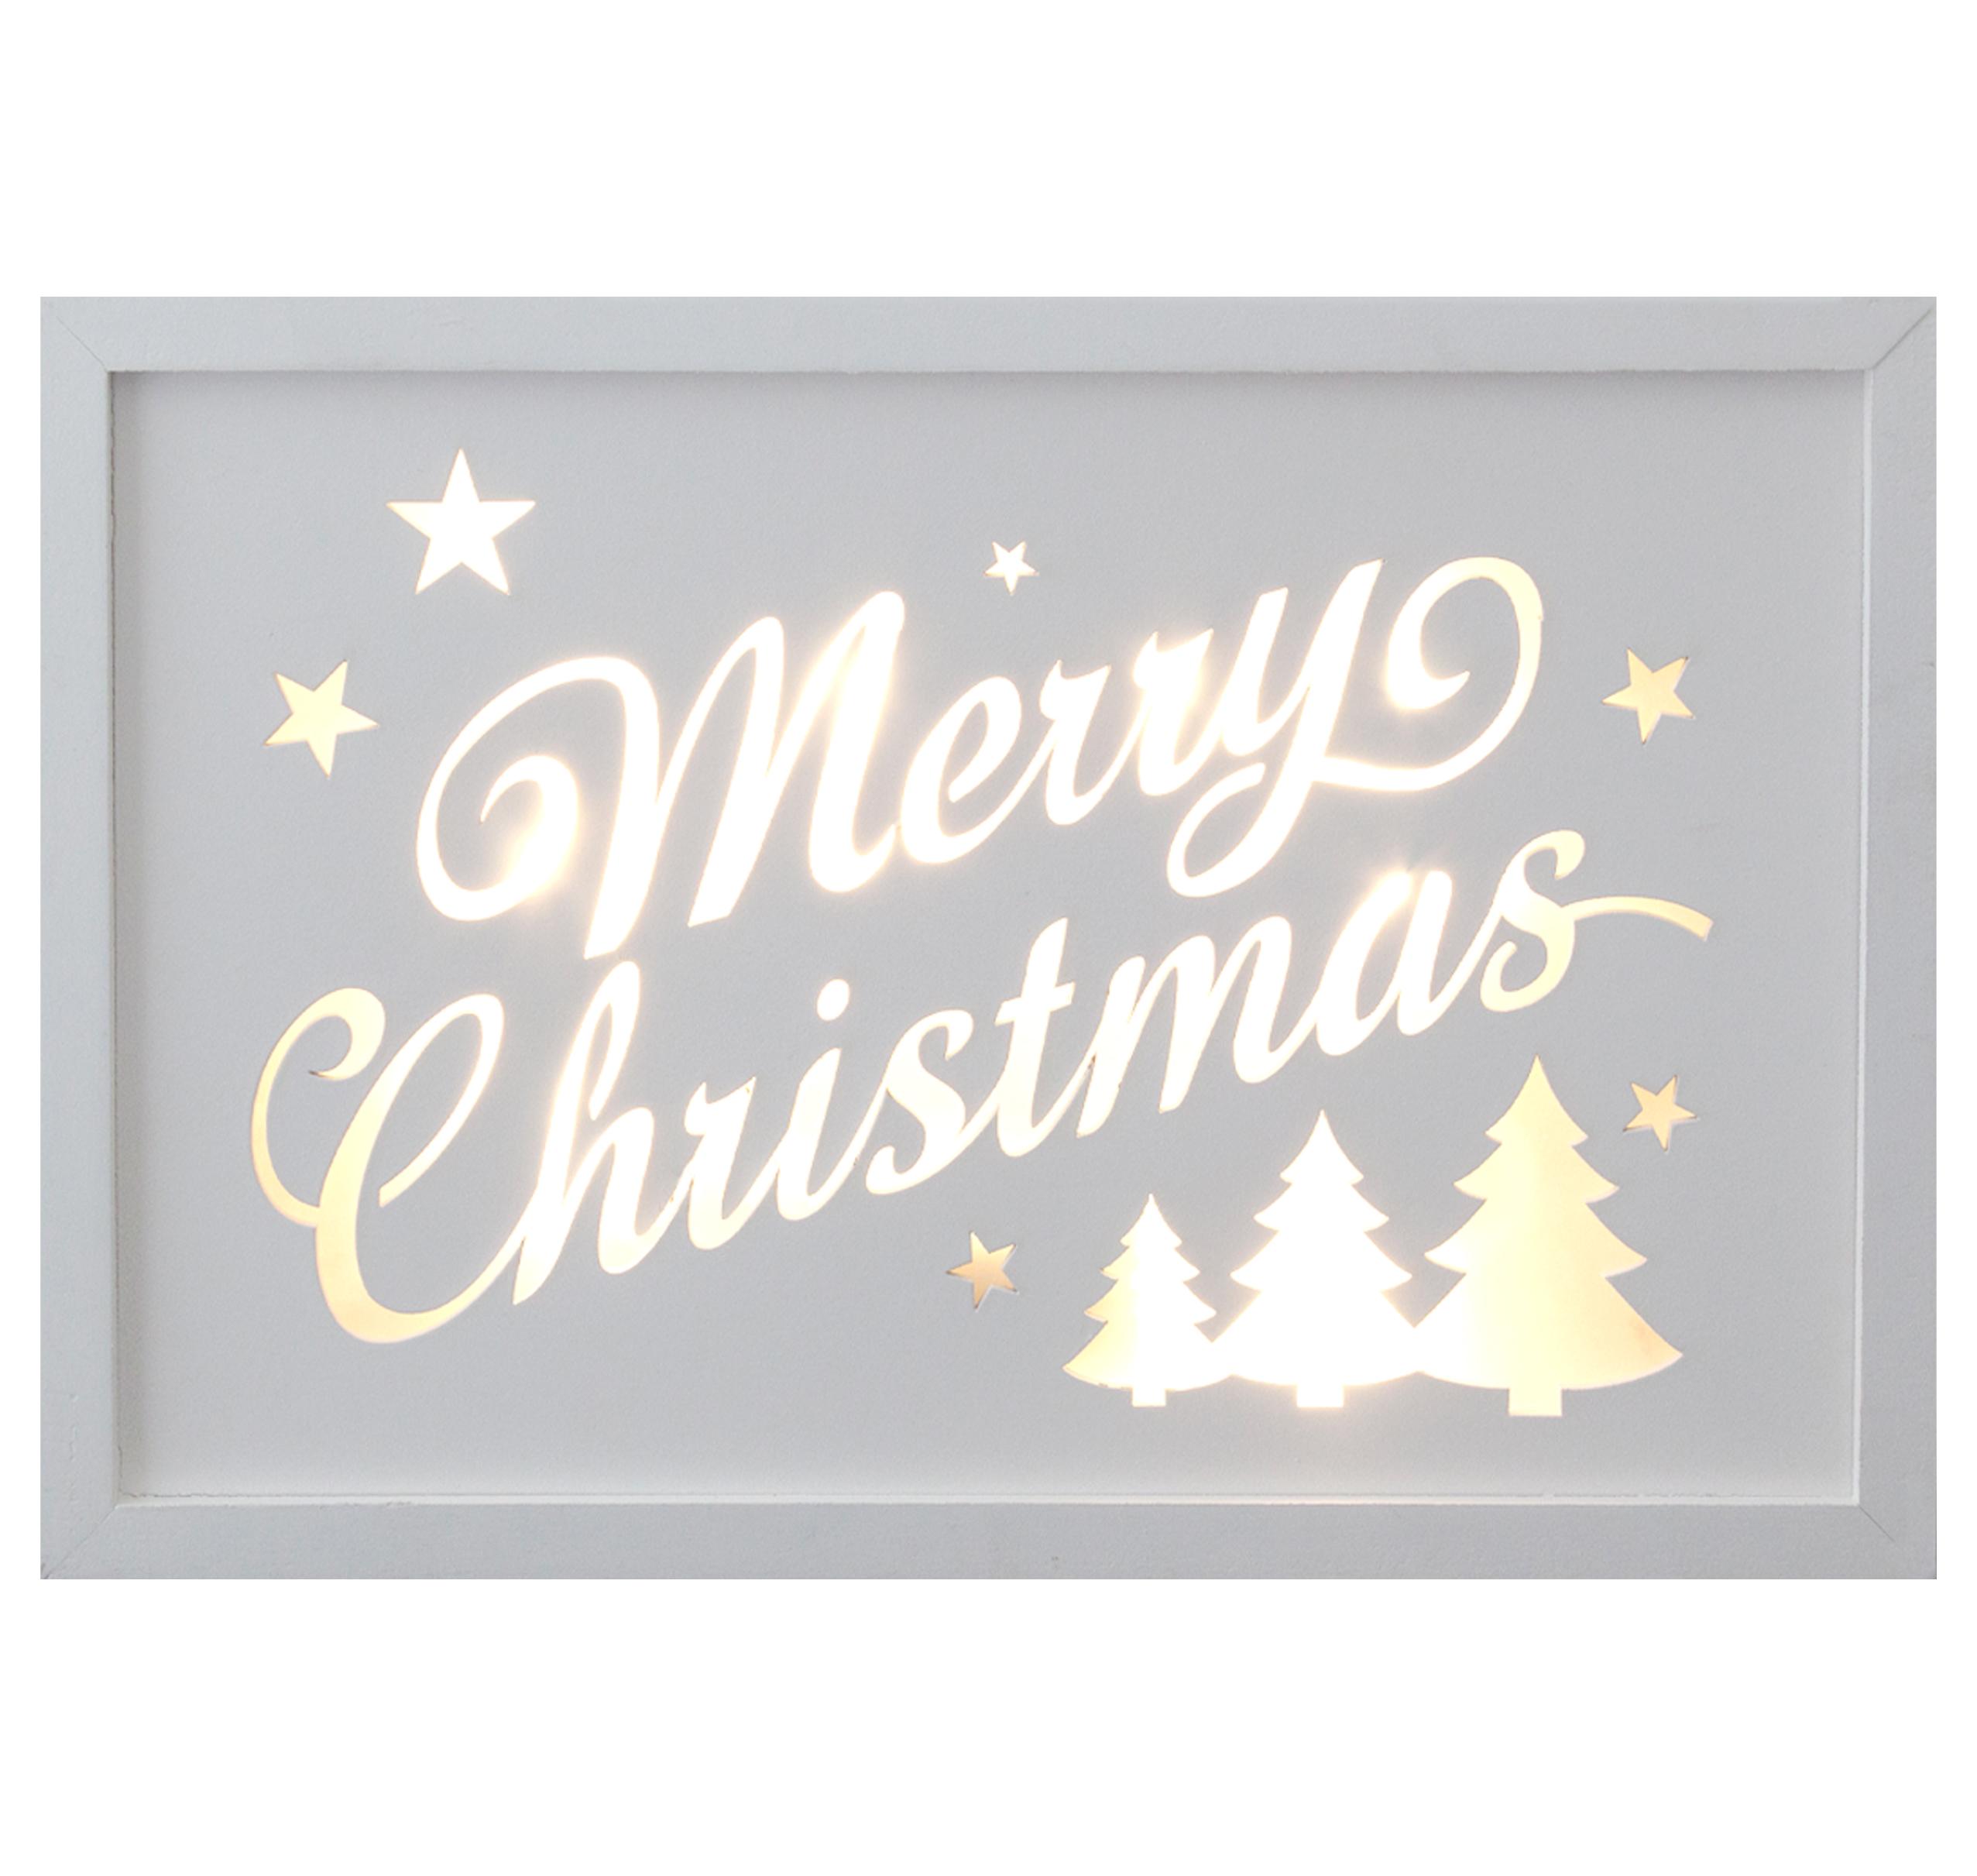 Décor Lites Wooden LED Box White Merry Christmas Trees